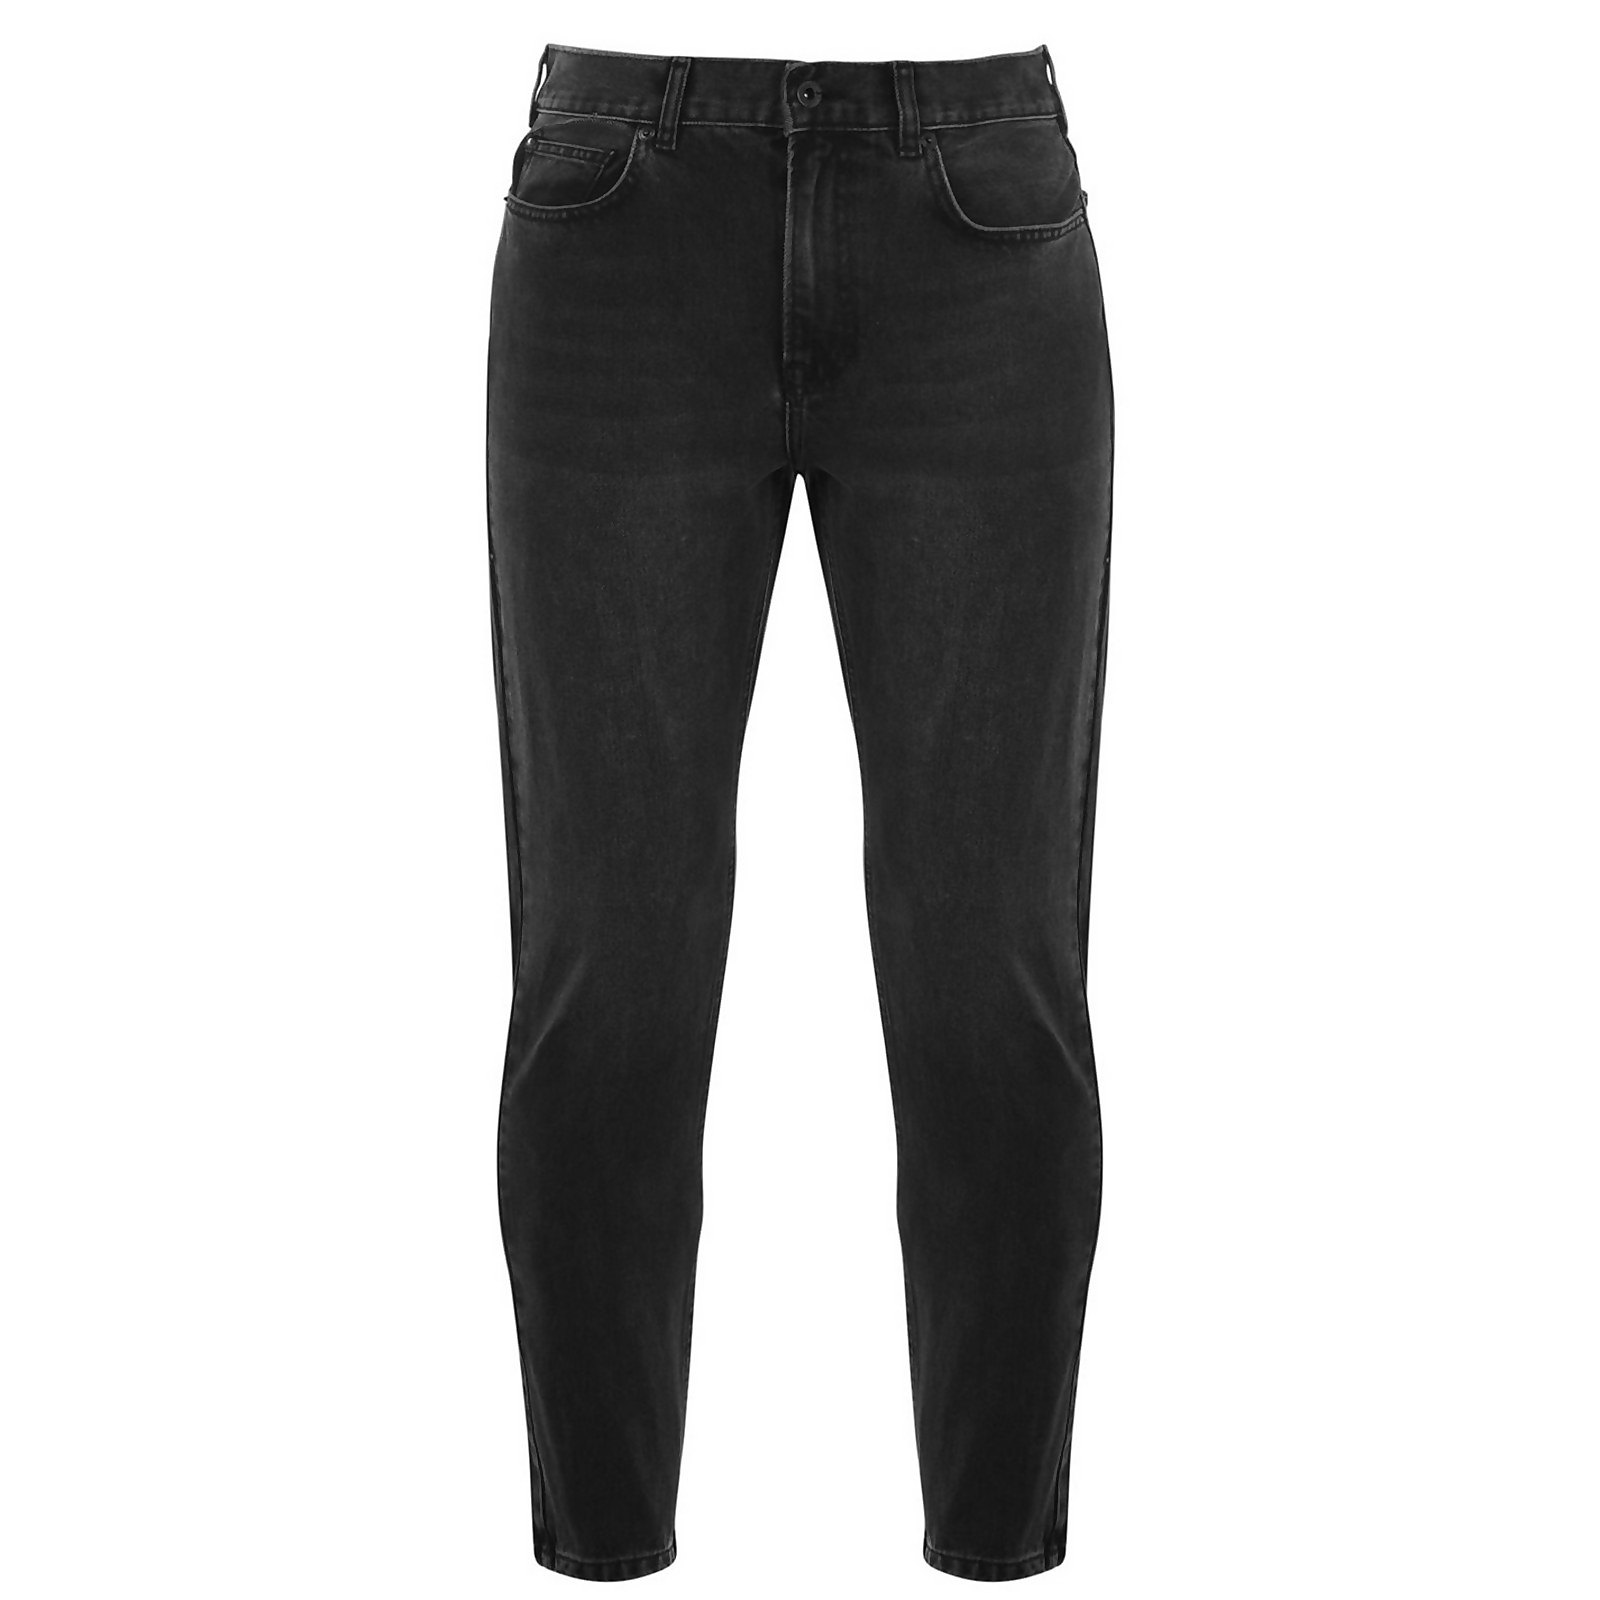 Slim Tapered Jeans - Black - 32R